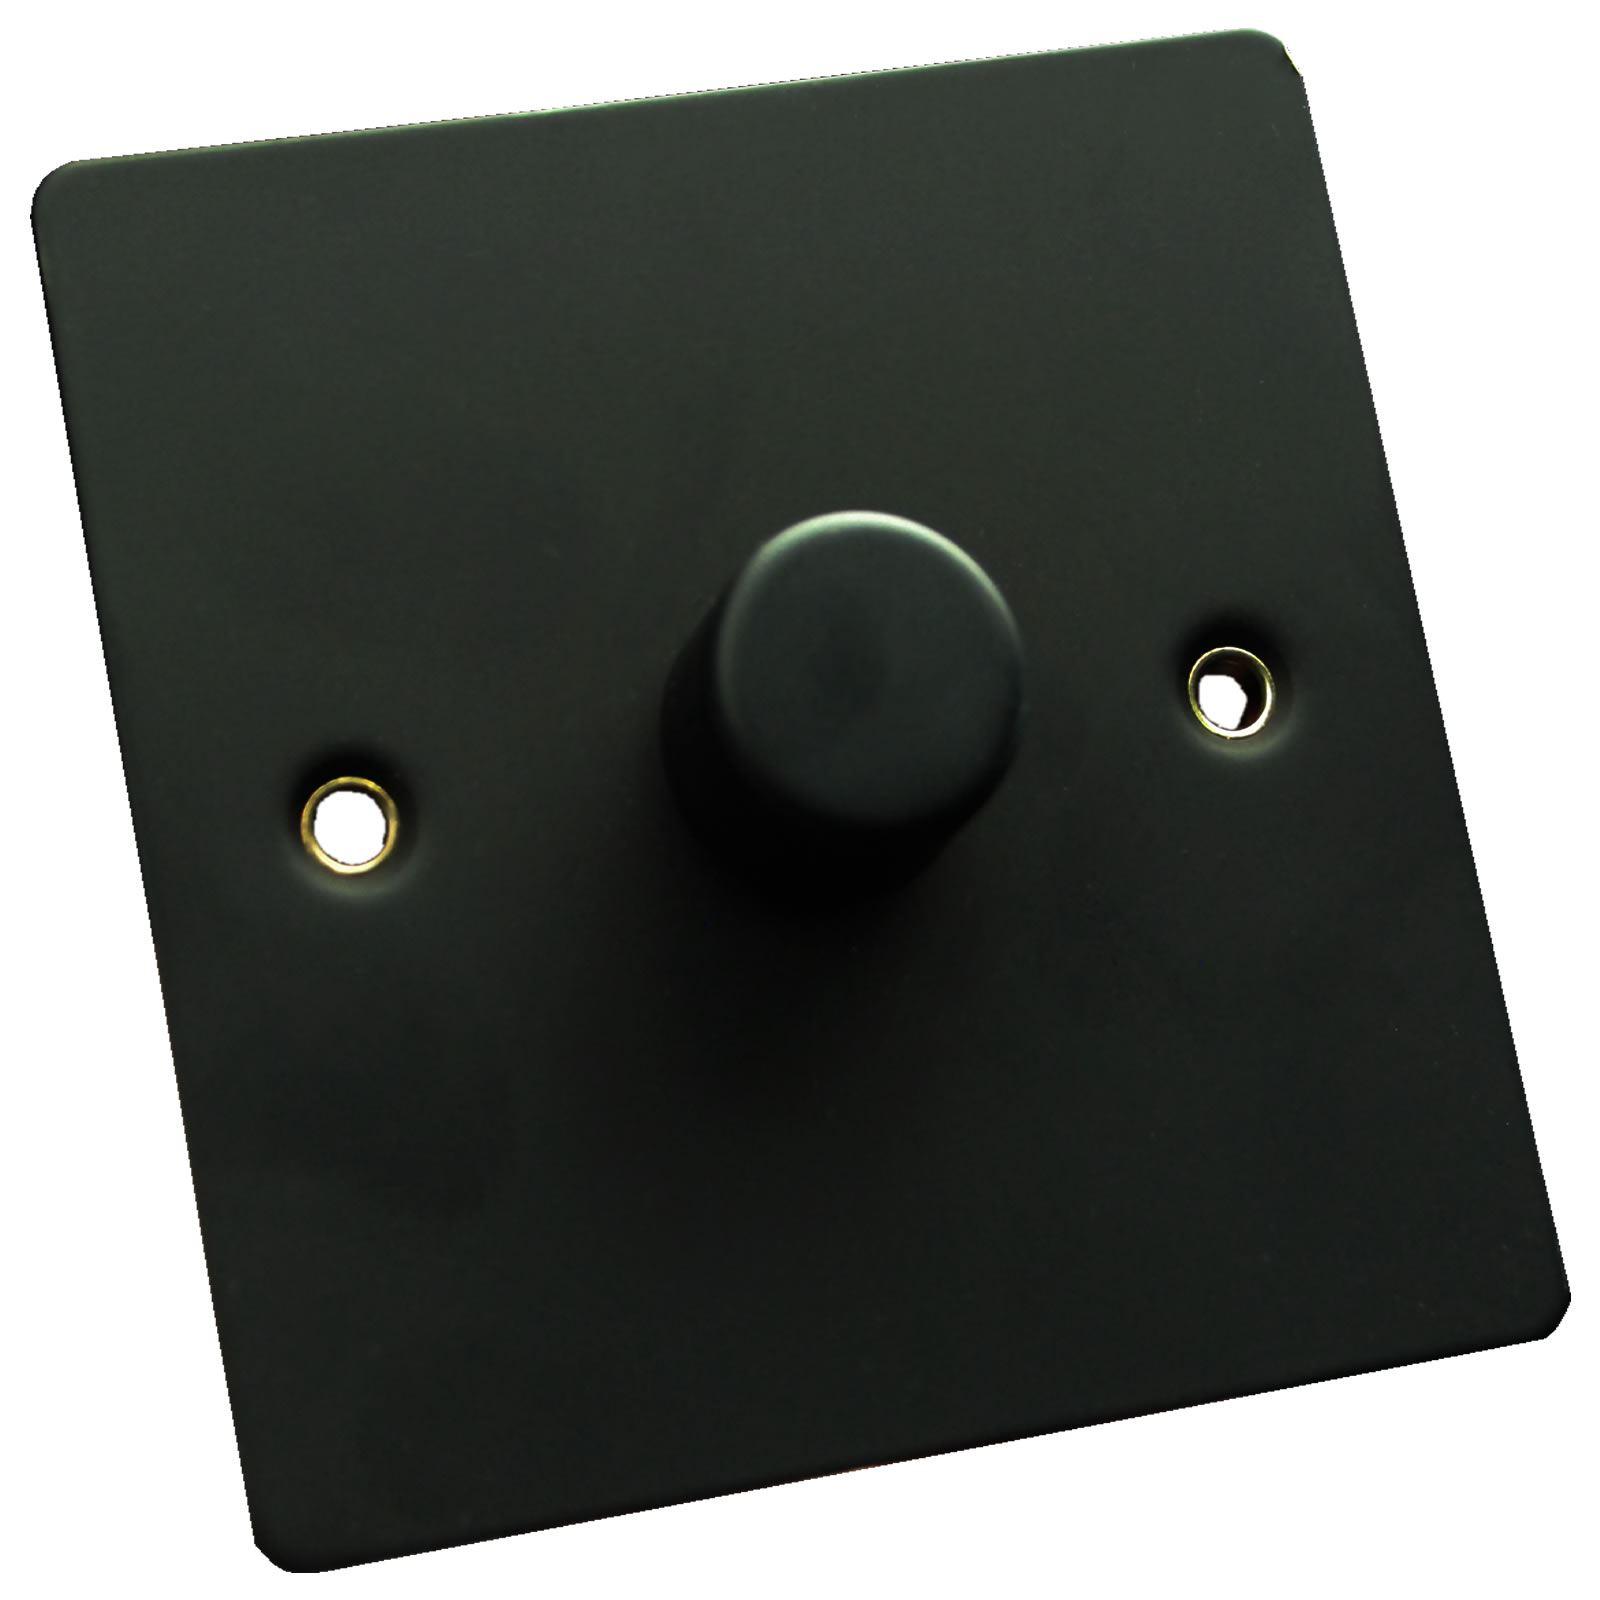 Flat Matte Black Dimmer Light Switch 400w 1 Gang Or 2 Way Main